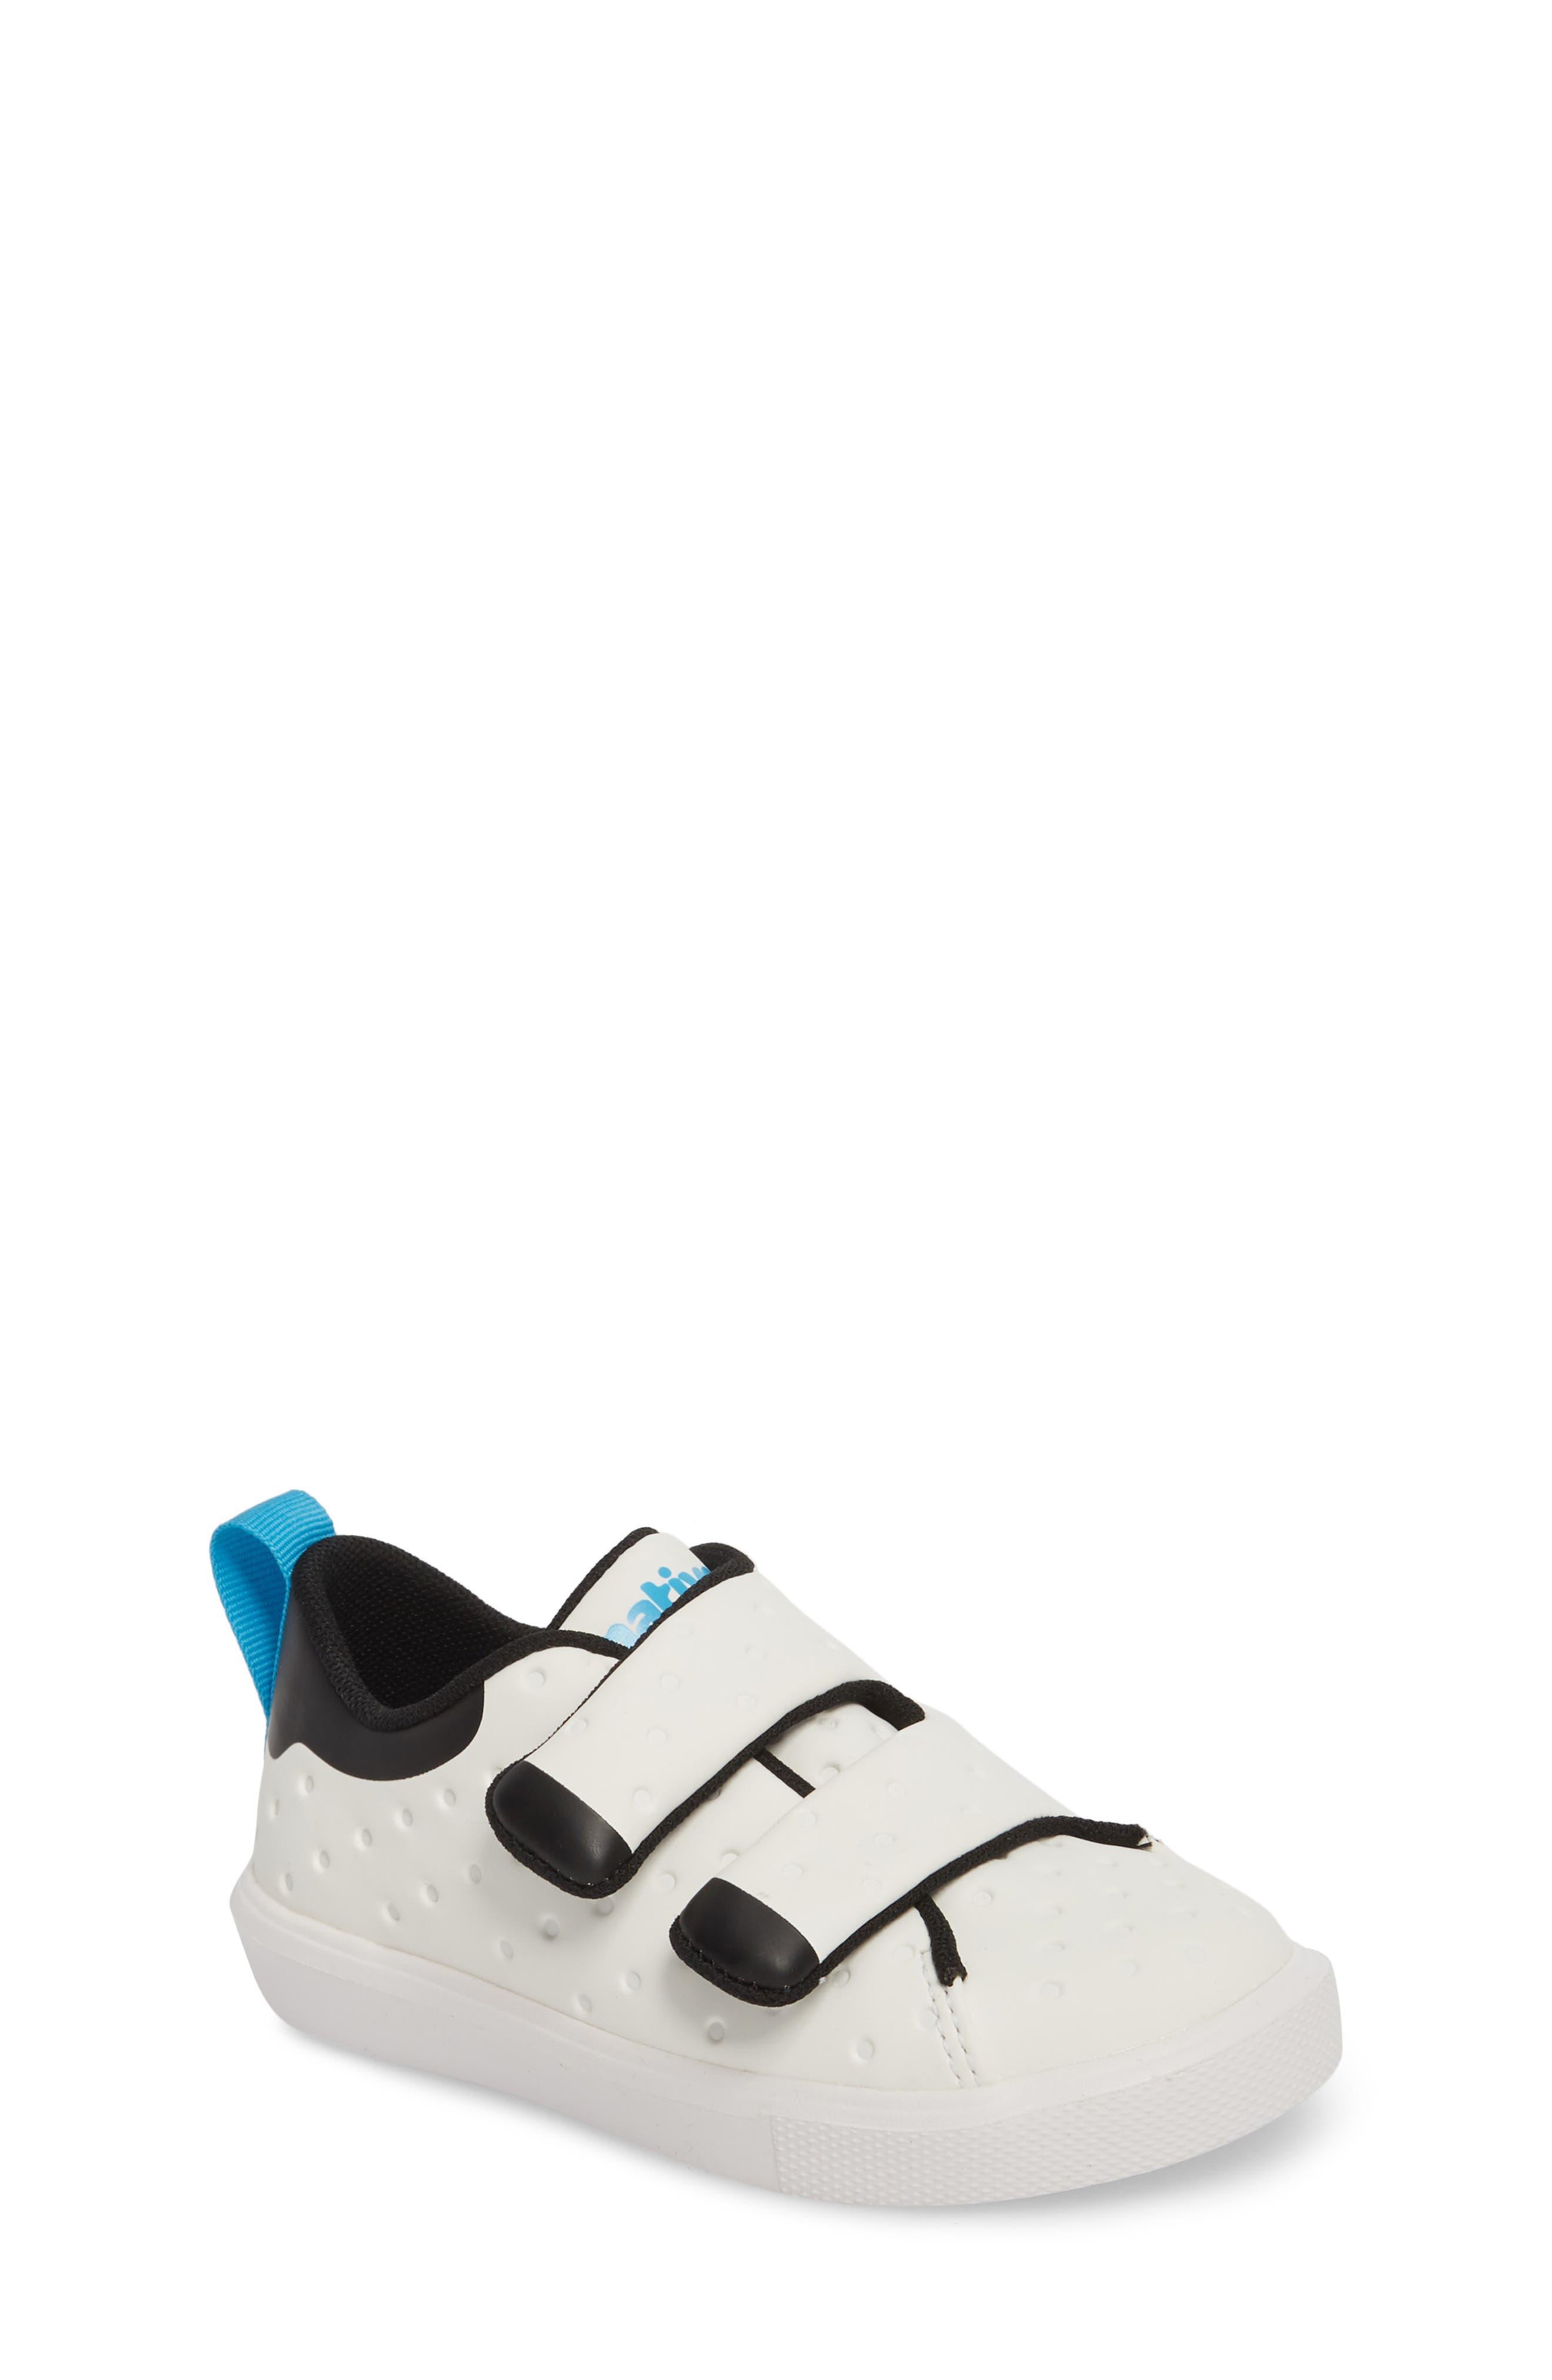 Monaco Sneaker,                         Main,                         color, SHELL WHITE/ JIFFY BLACK